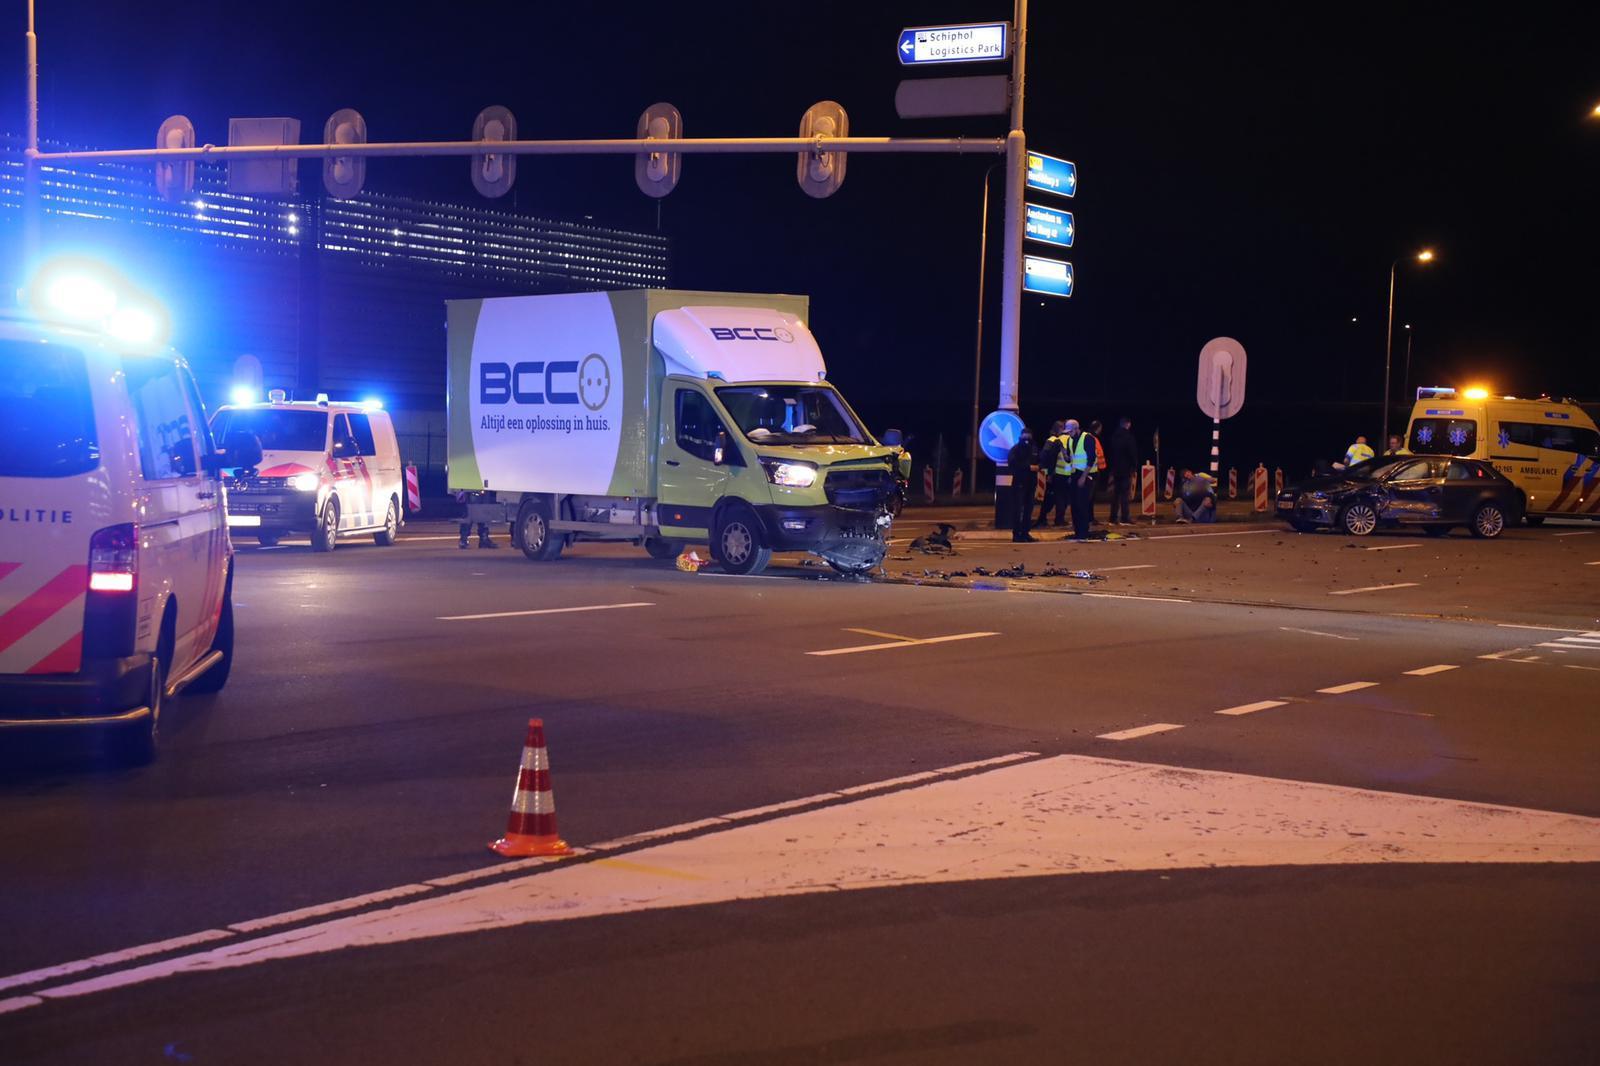 Gewonde na botsing tussen auto en bestelbus in Schiphol-Rijk